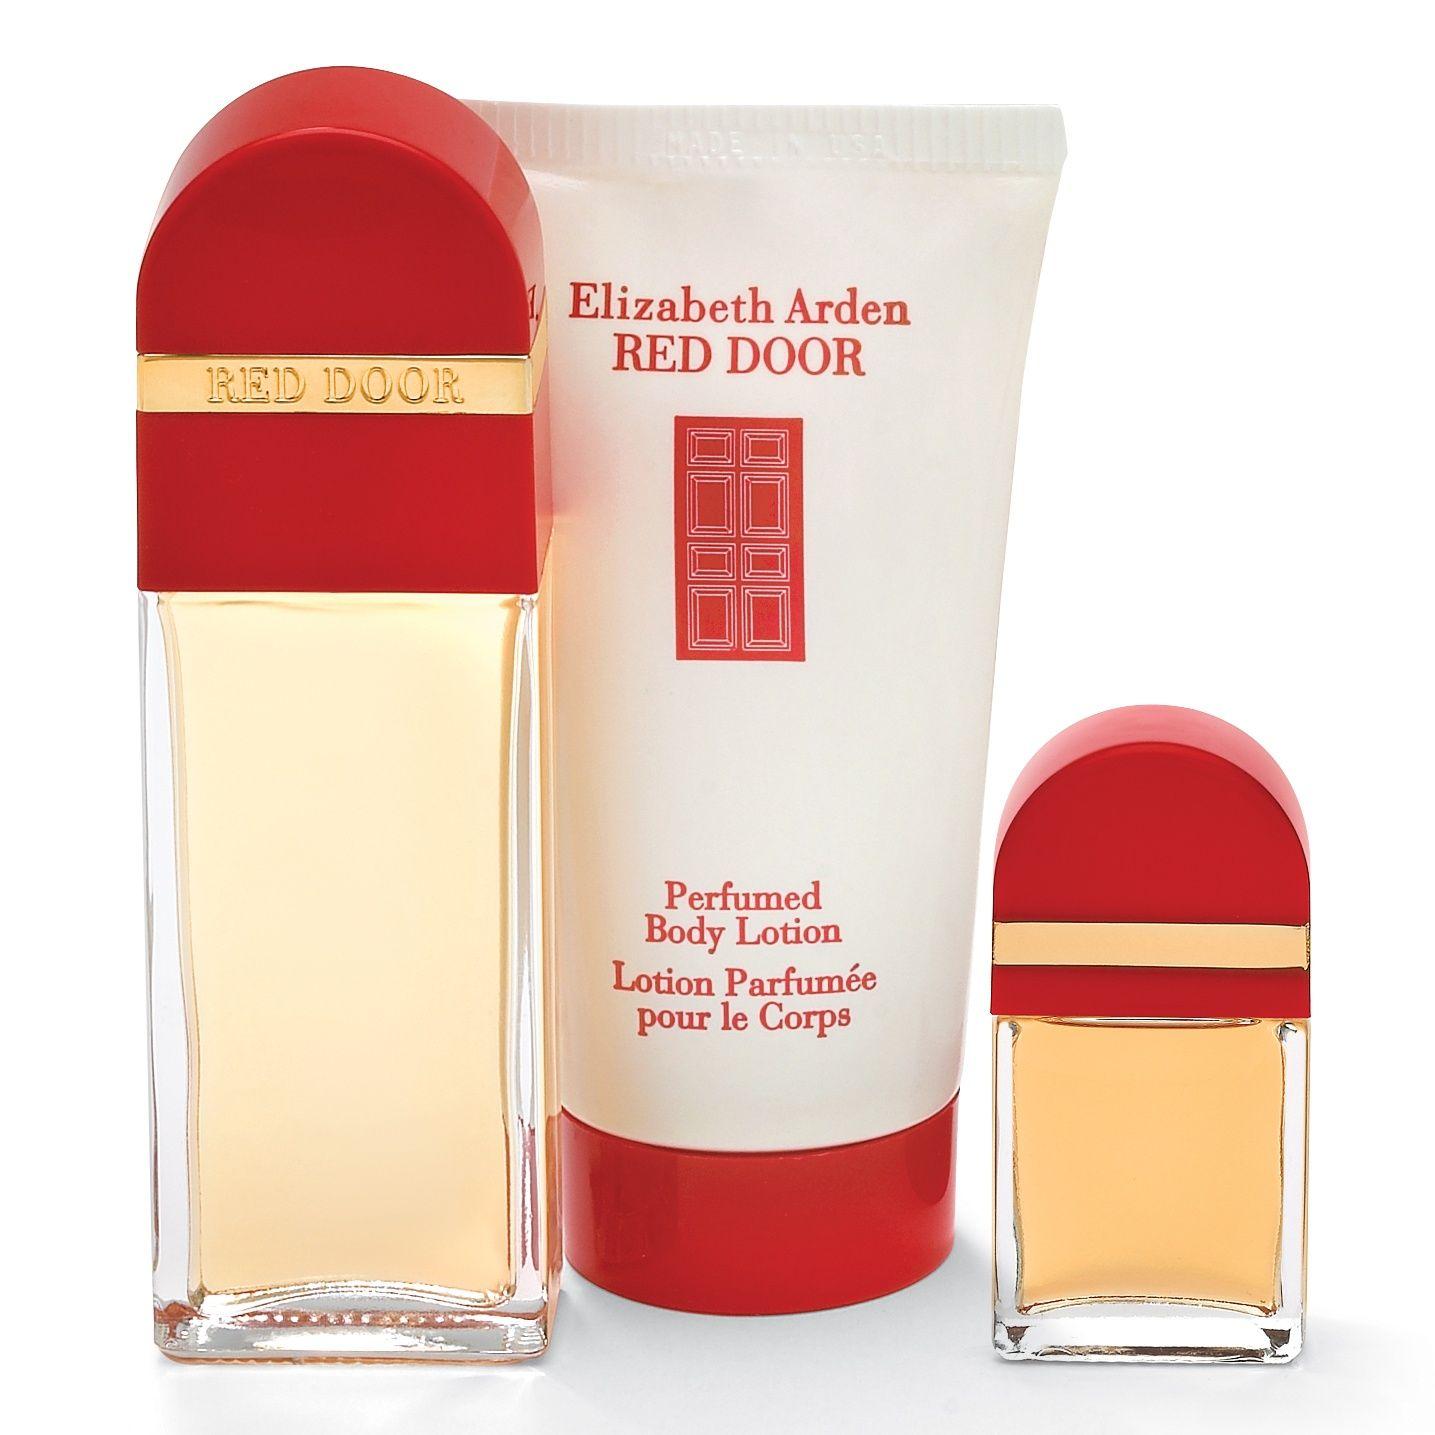 Perfume Gift Set Ladies Fragrances Red Door By Elizabeth Arden 3